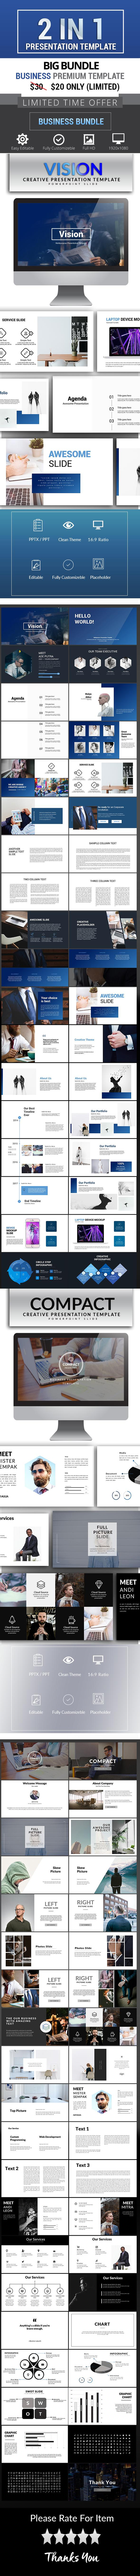 GraphicRiver 2 in 1 Business Bundle Keynote 20813329